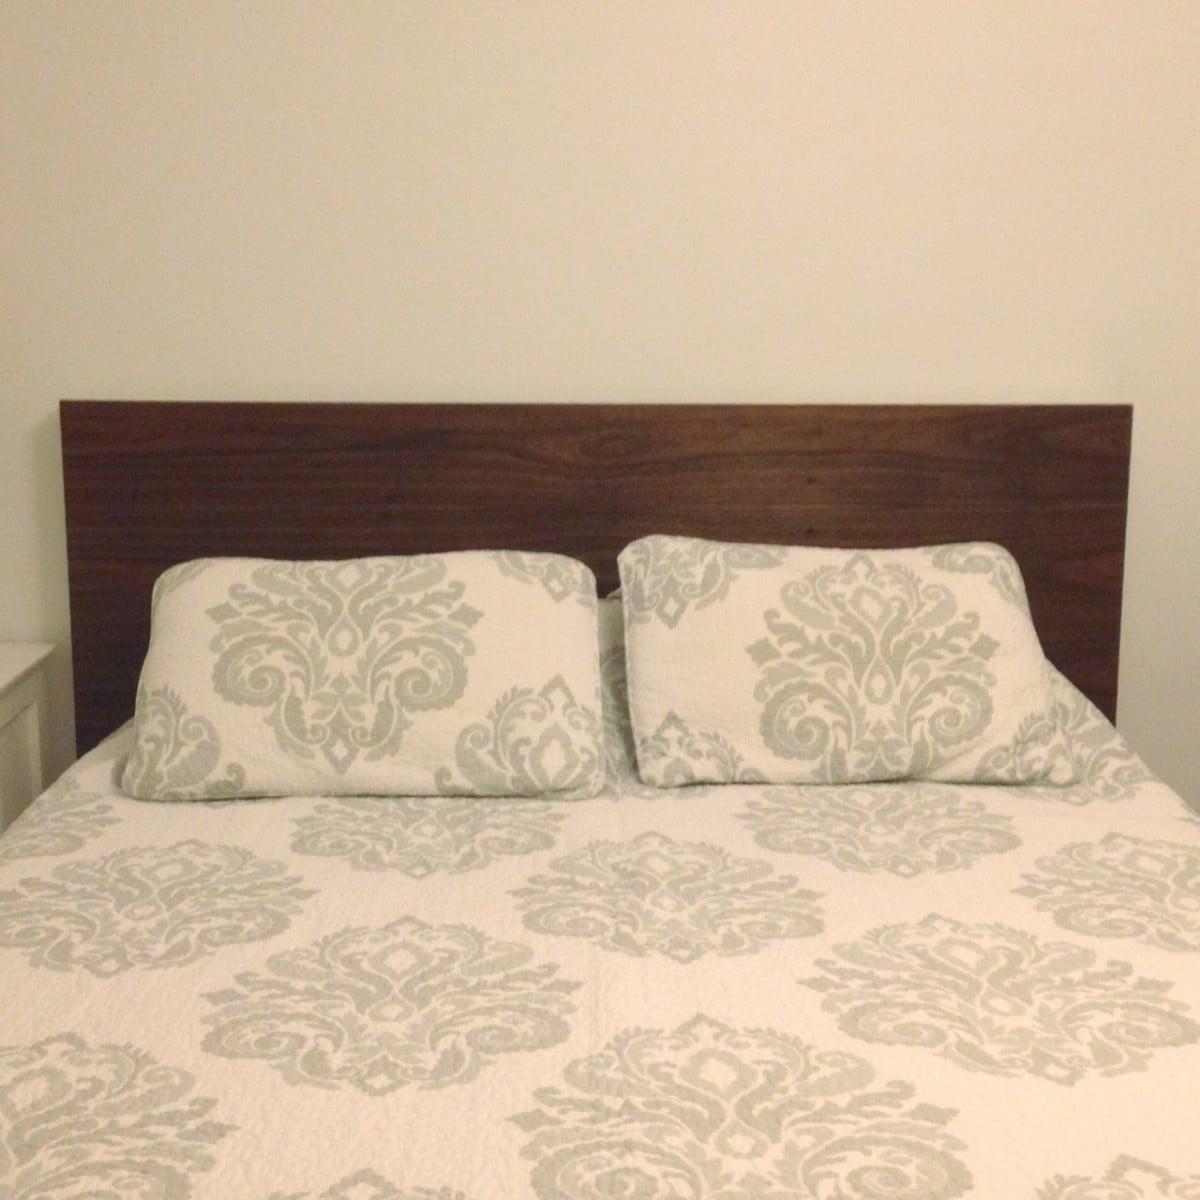 walnut trondheim case study bed ikea hackers. Black Bedroom Furniture Sets. Home Design Ideas